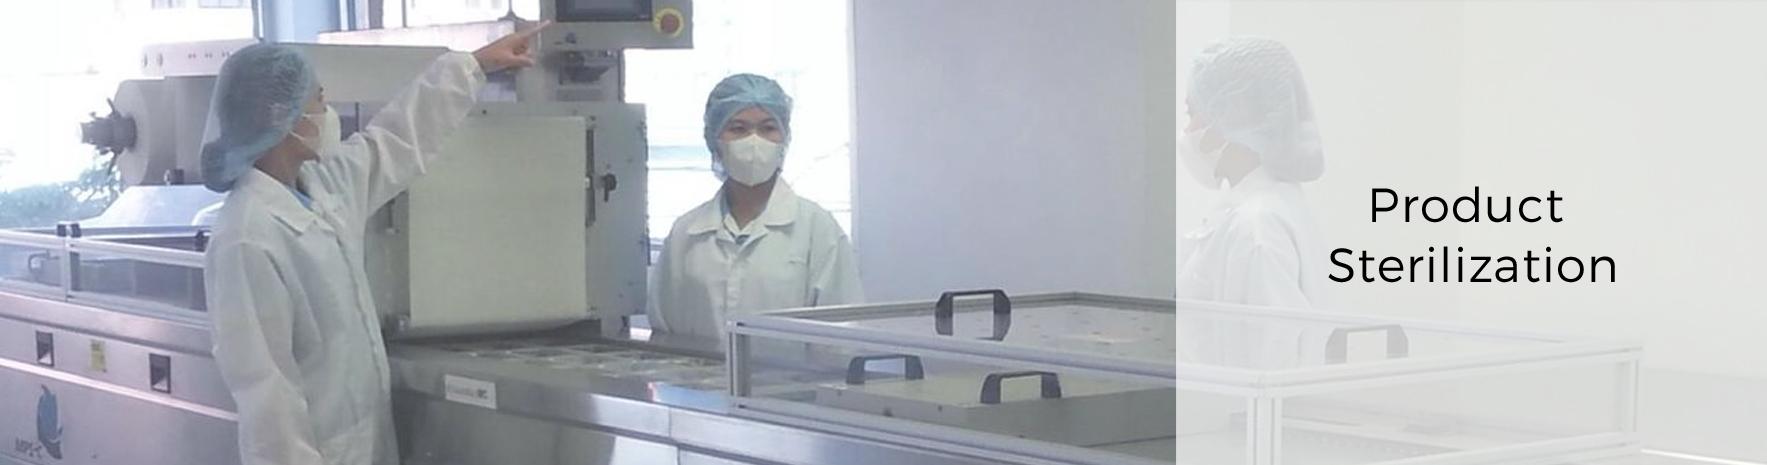 medvance-product-sterilization-banner-2